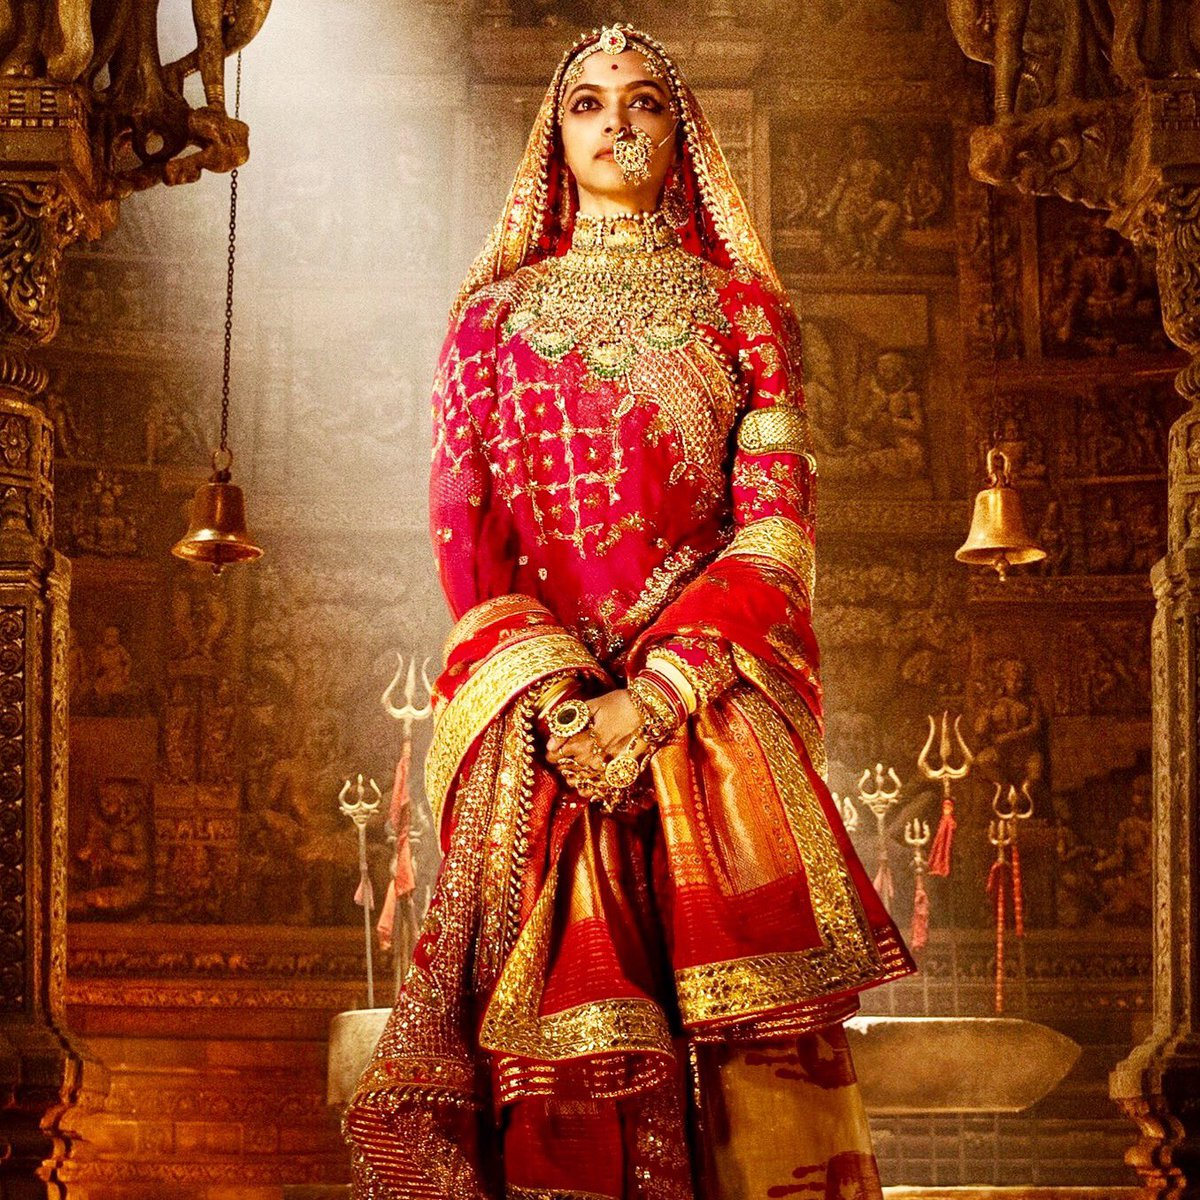 Deepika Padukone wants to keep the Jauhar outfit ...